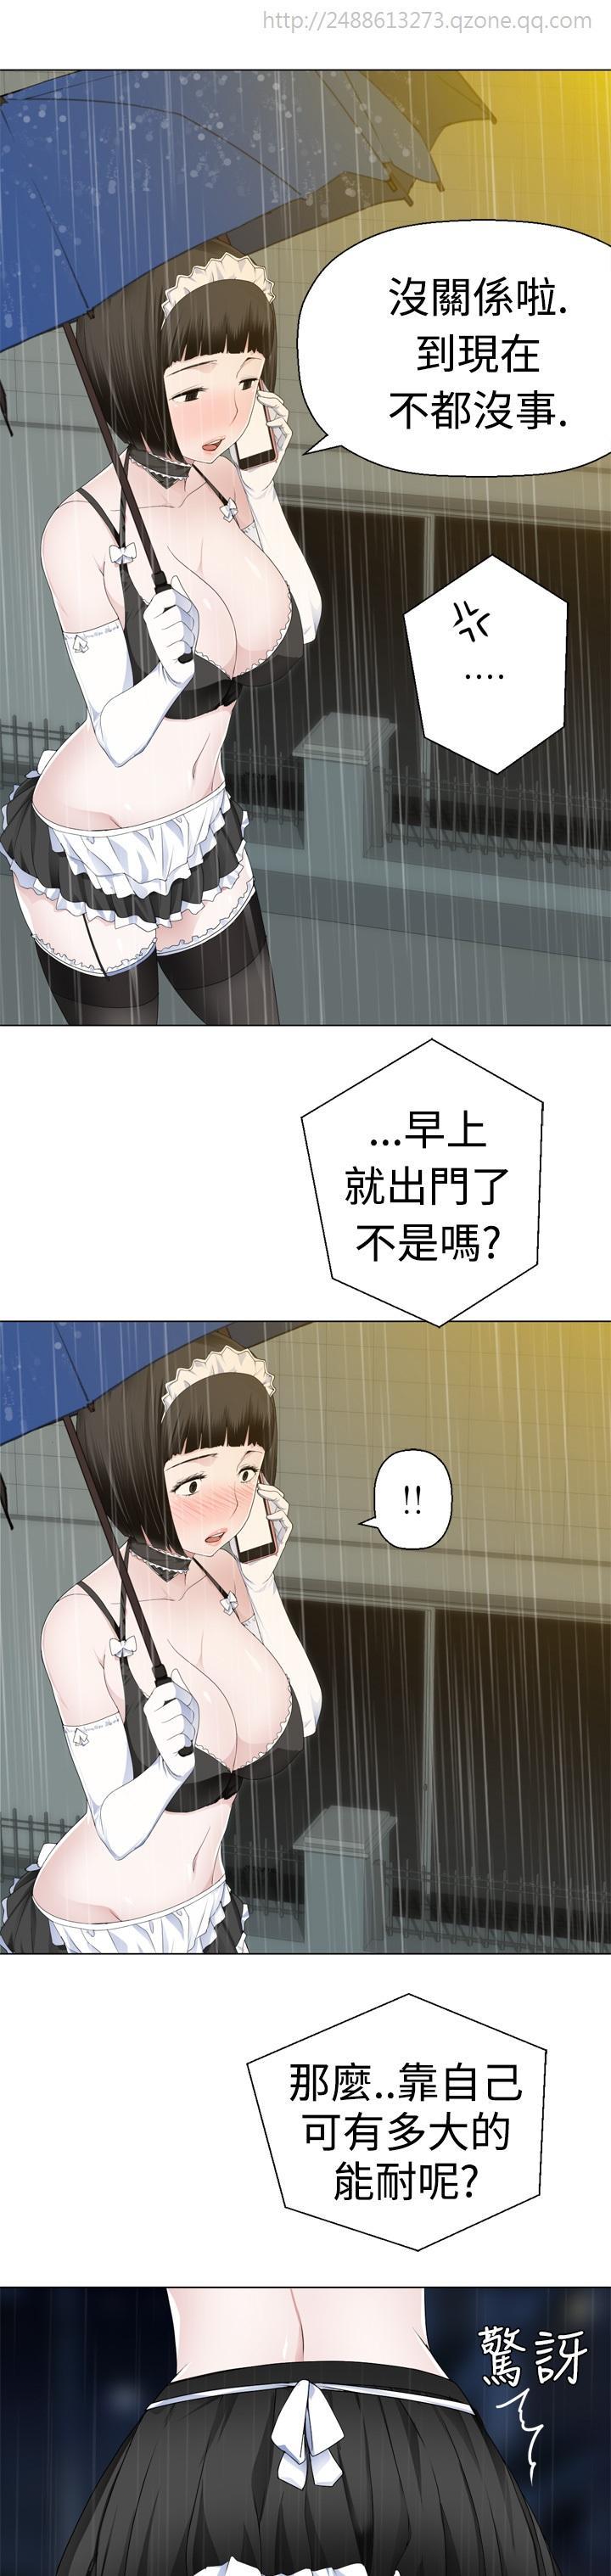 [SOSO] Franken Jo 为爱而生 法兰克赵 Ch.1~19 [Chinese]中文 188